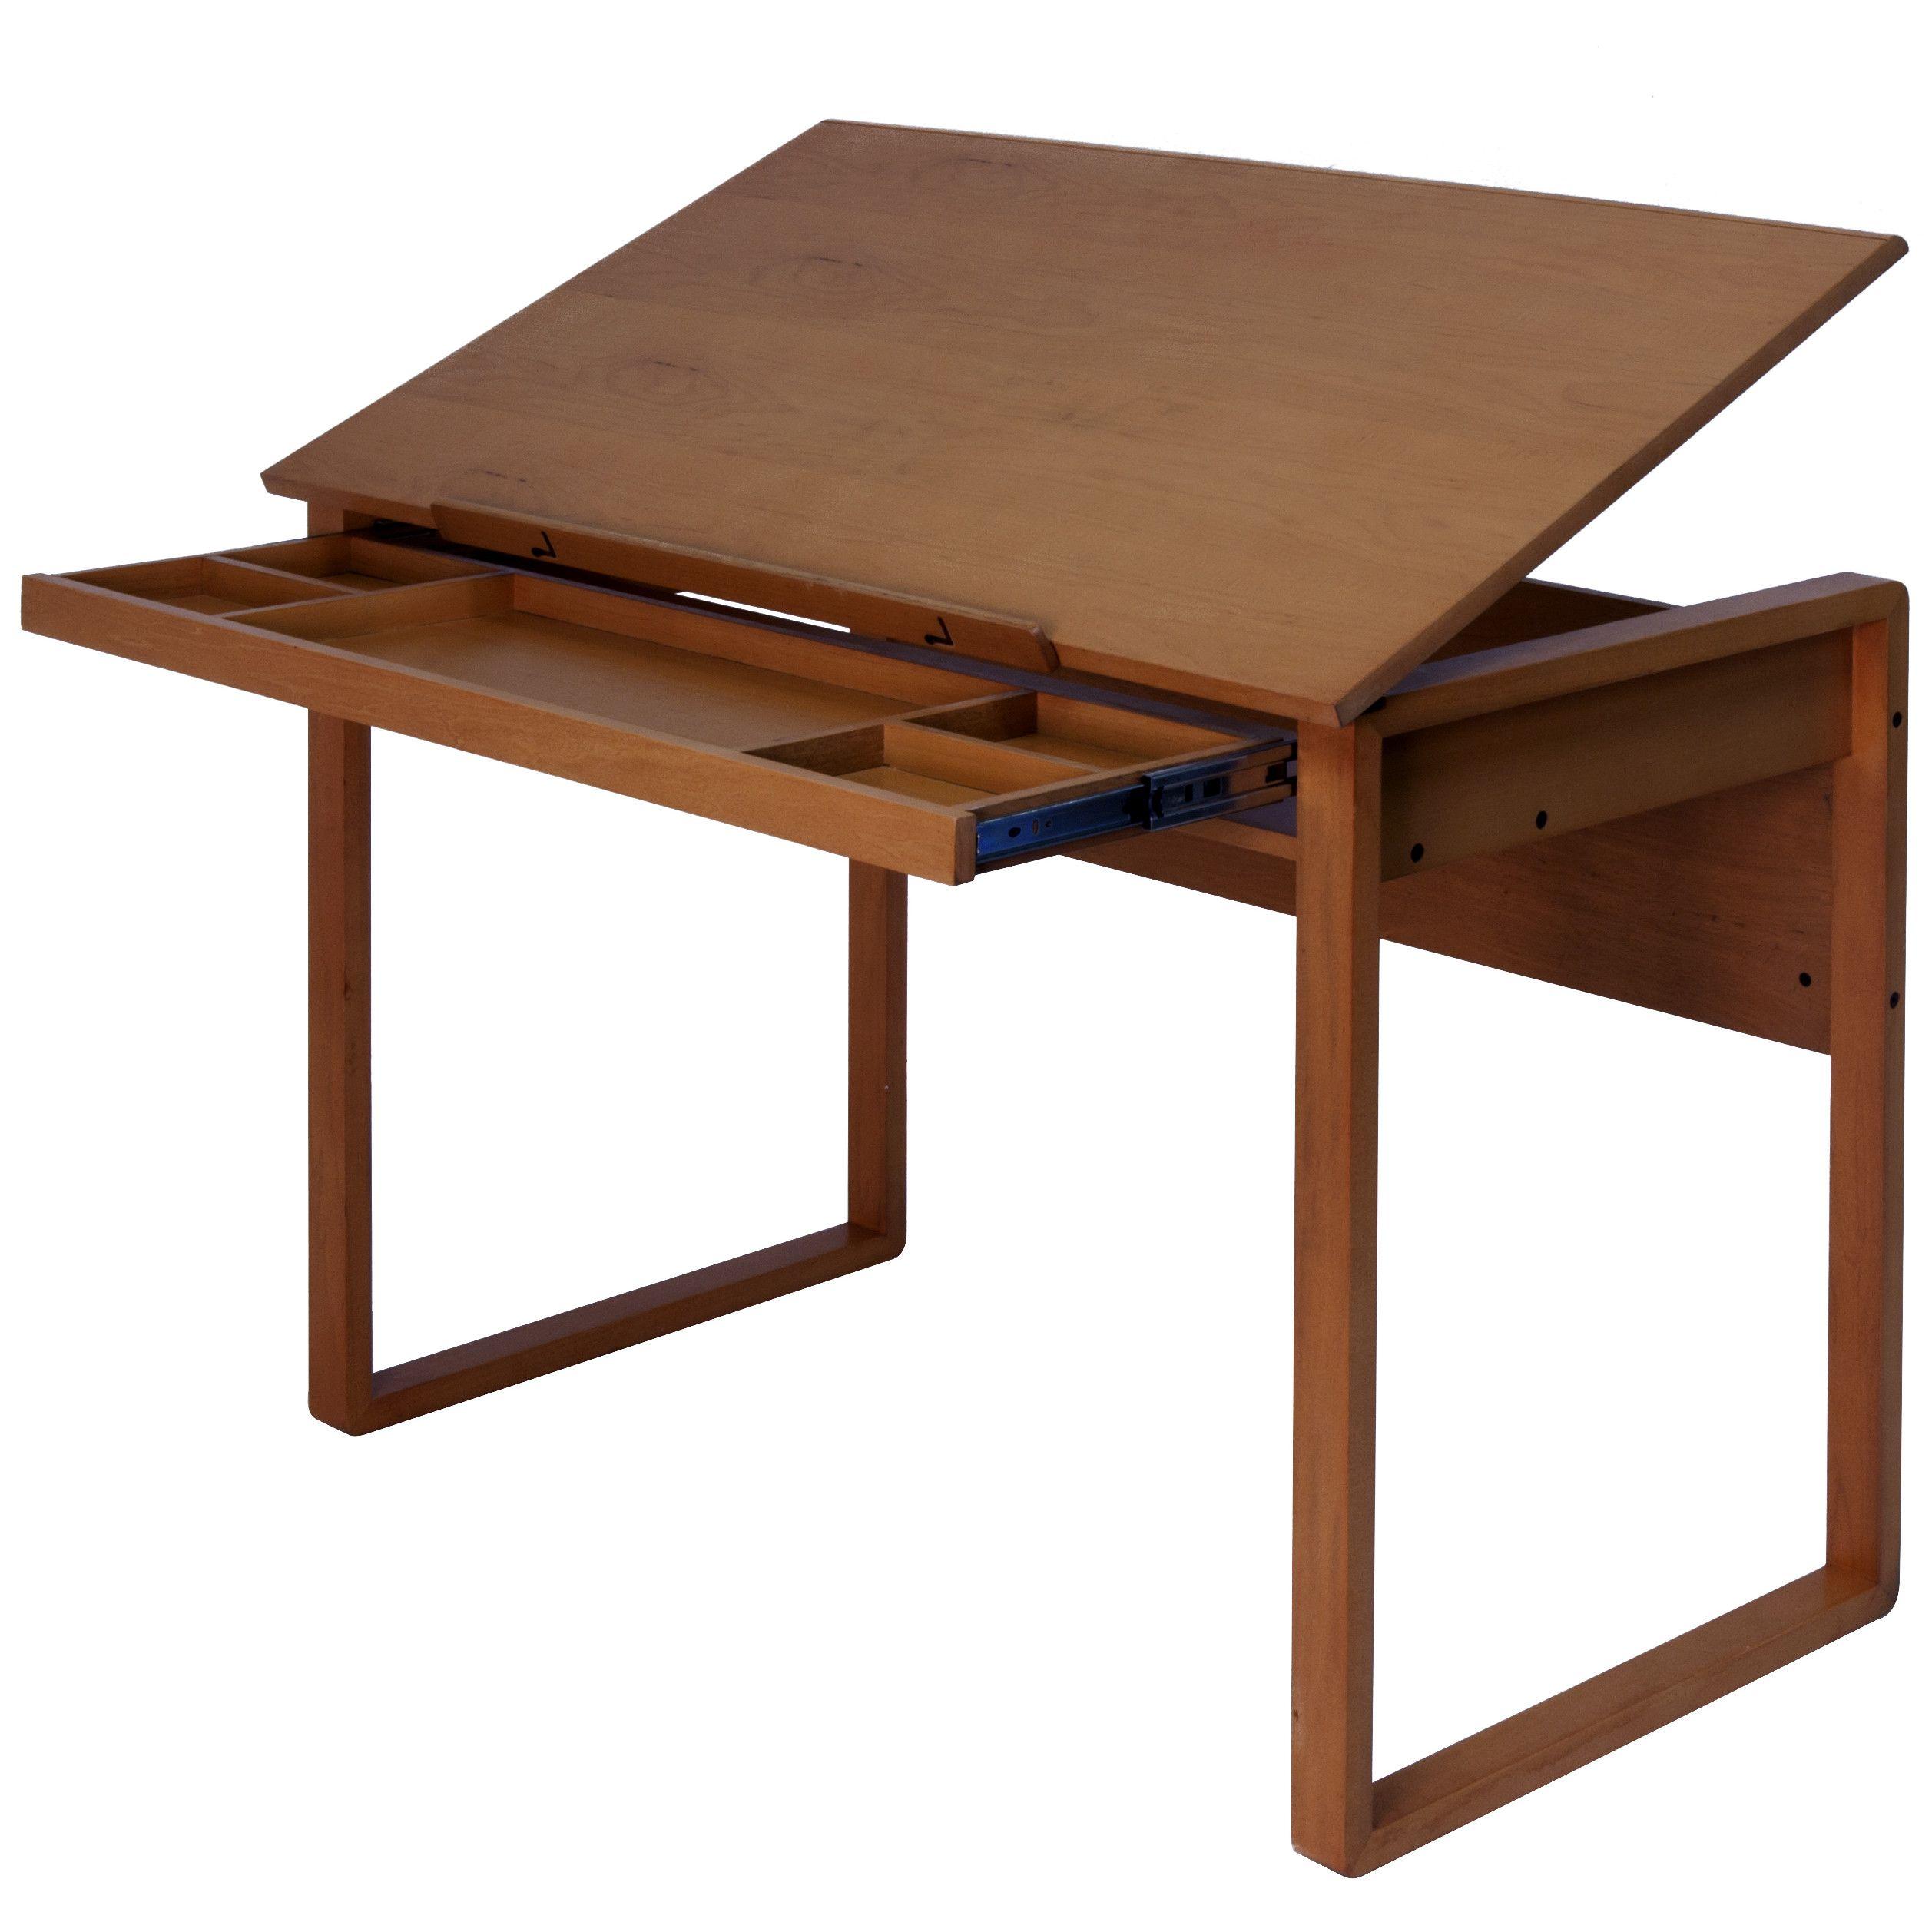 Imspiring Design Drafting Table Ideas Brown Wooden Drafting Table